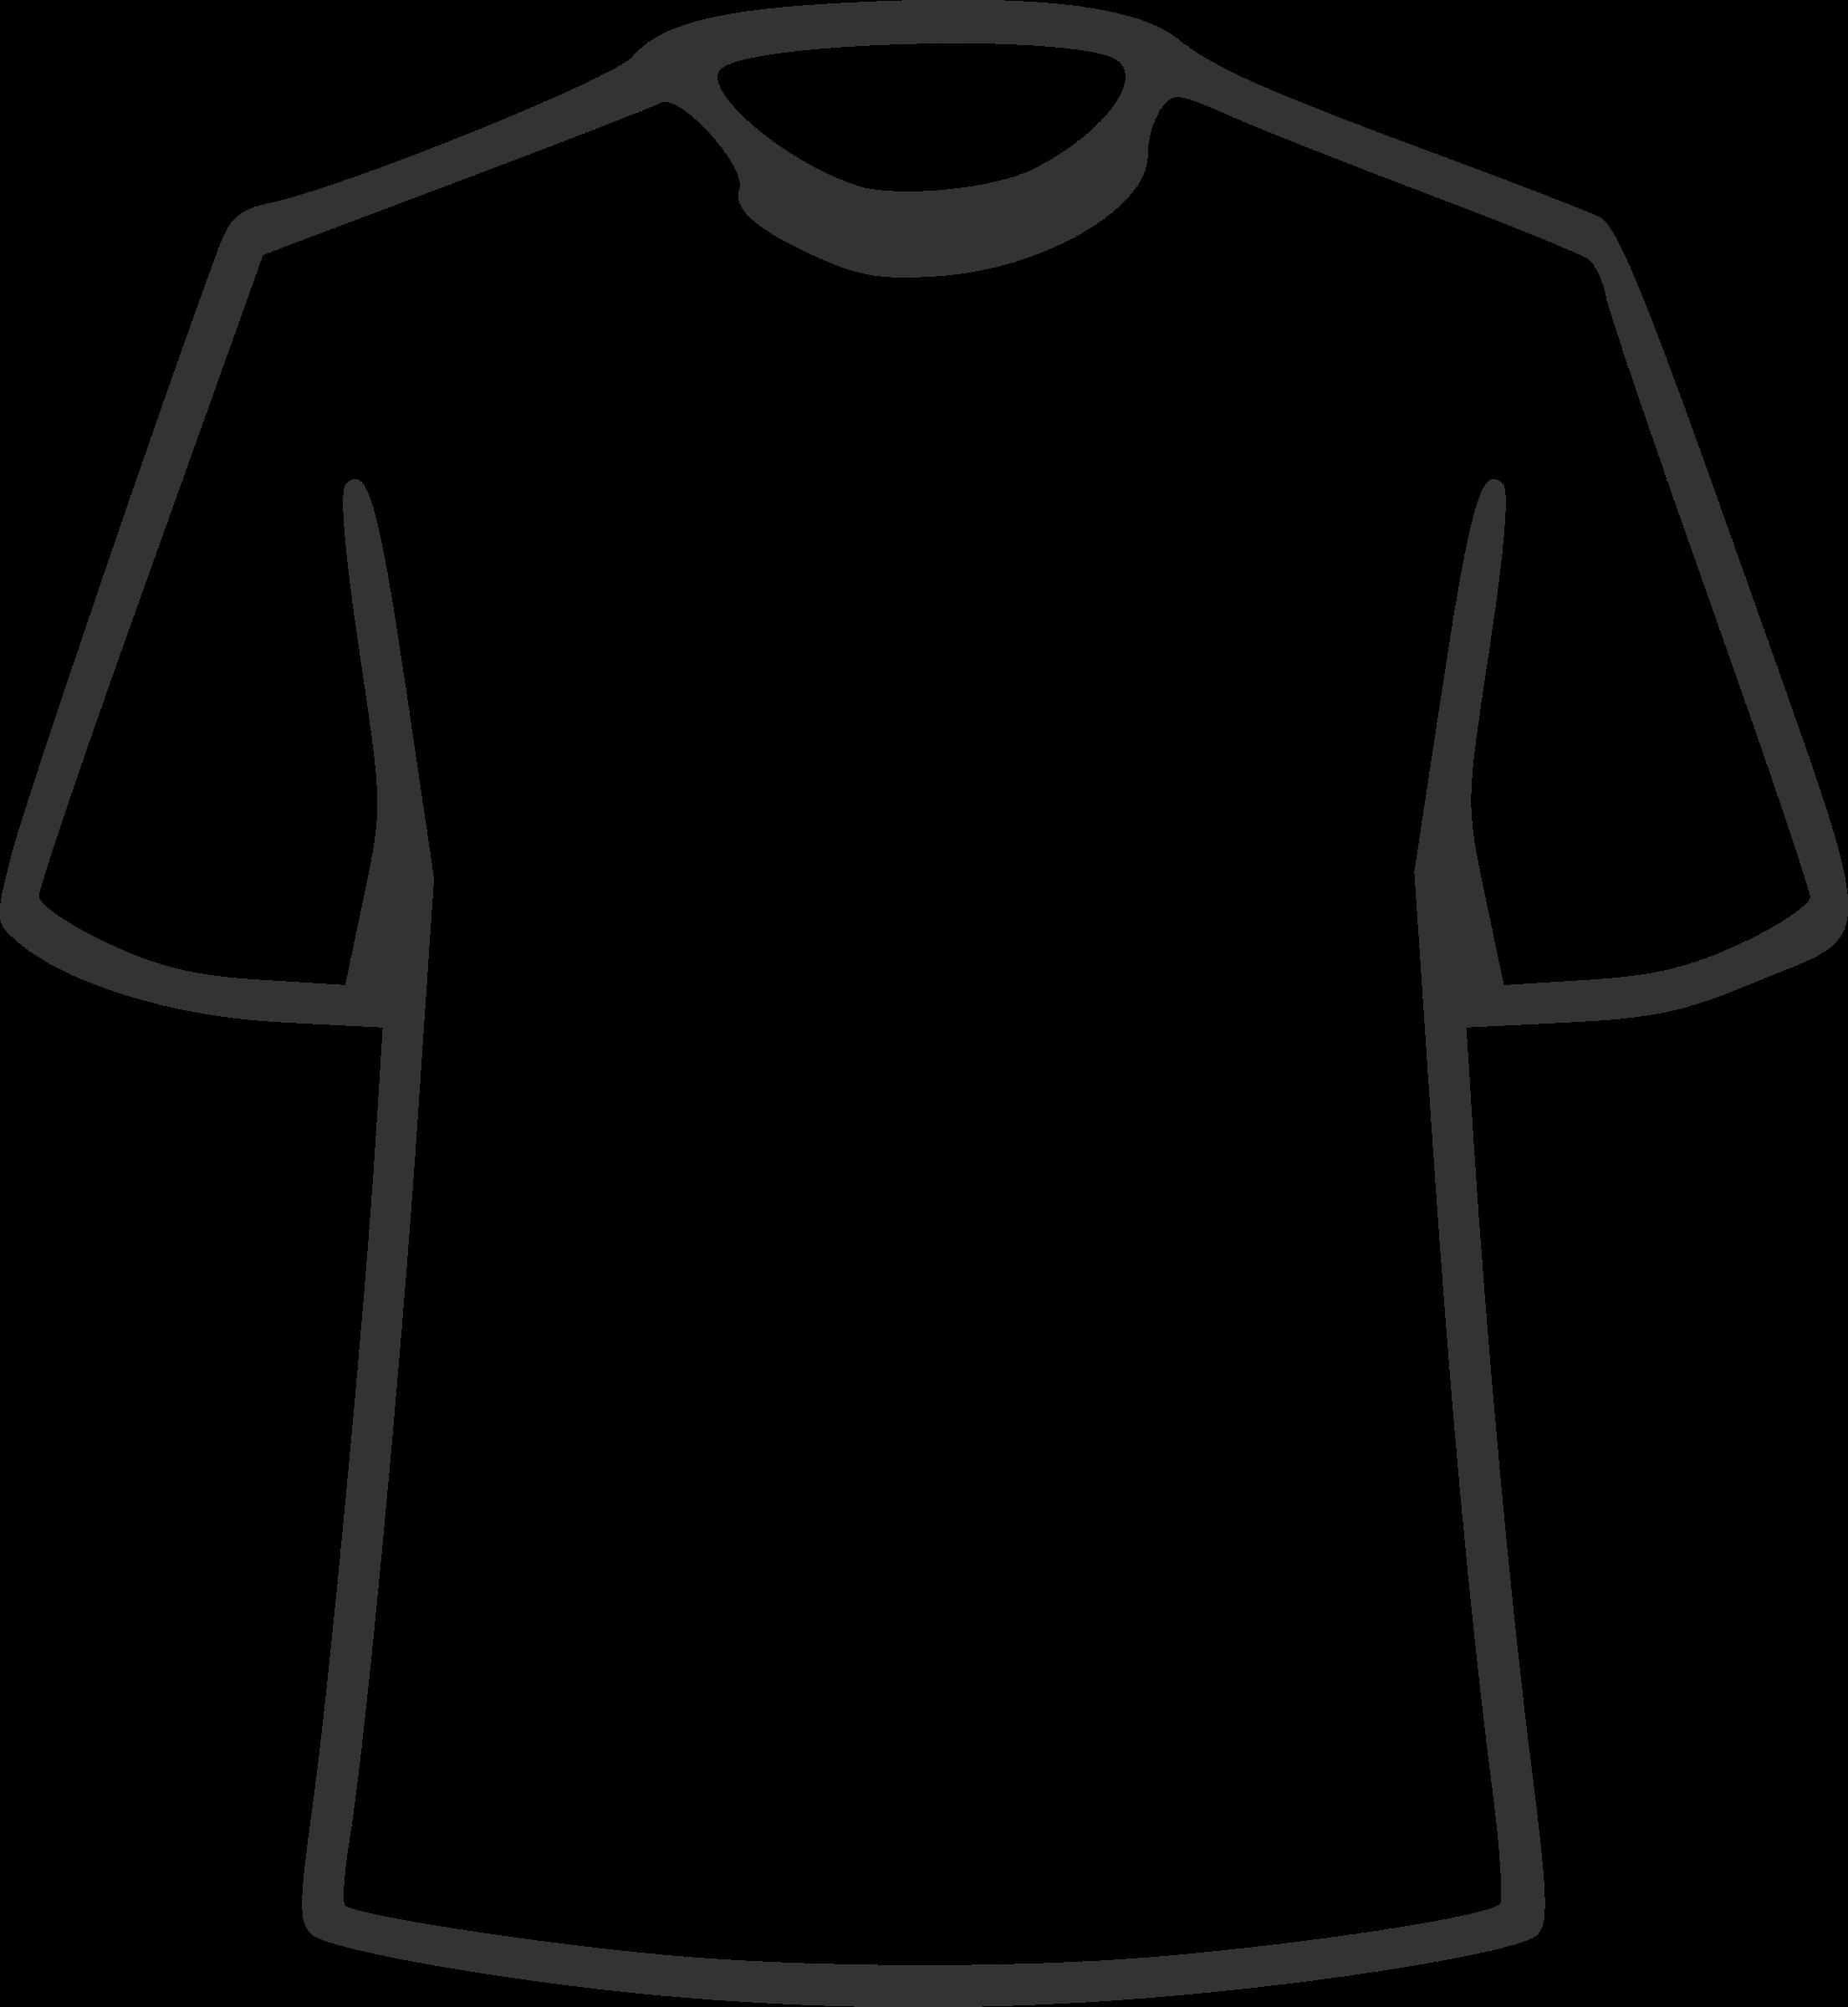 Clipart shirt uniform. Simple big image png